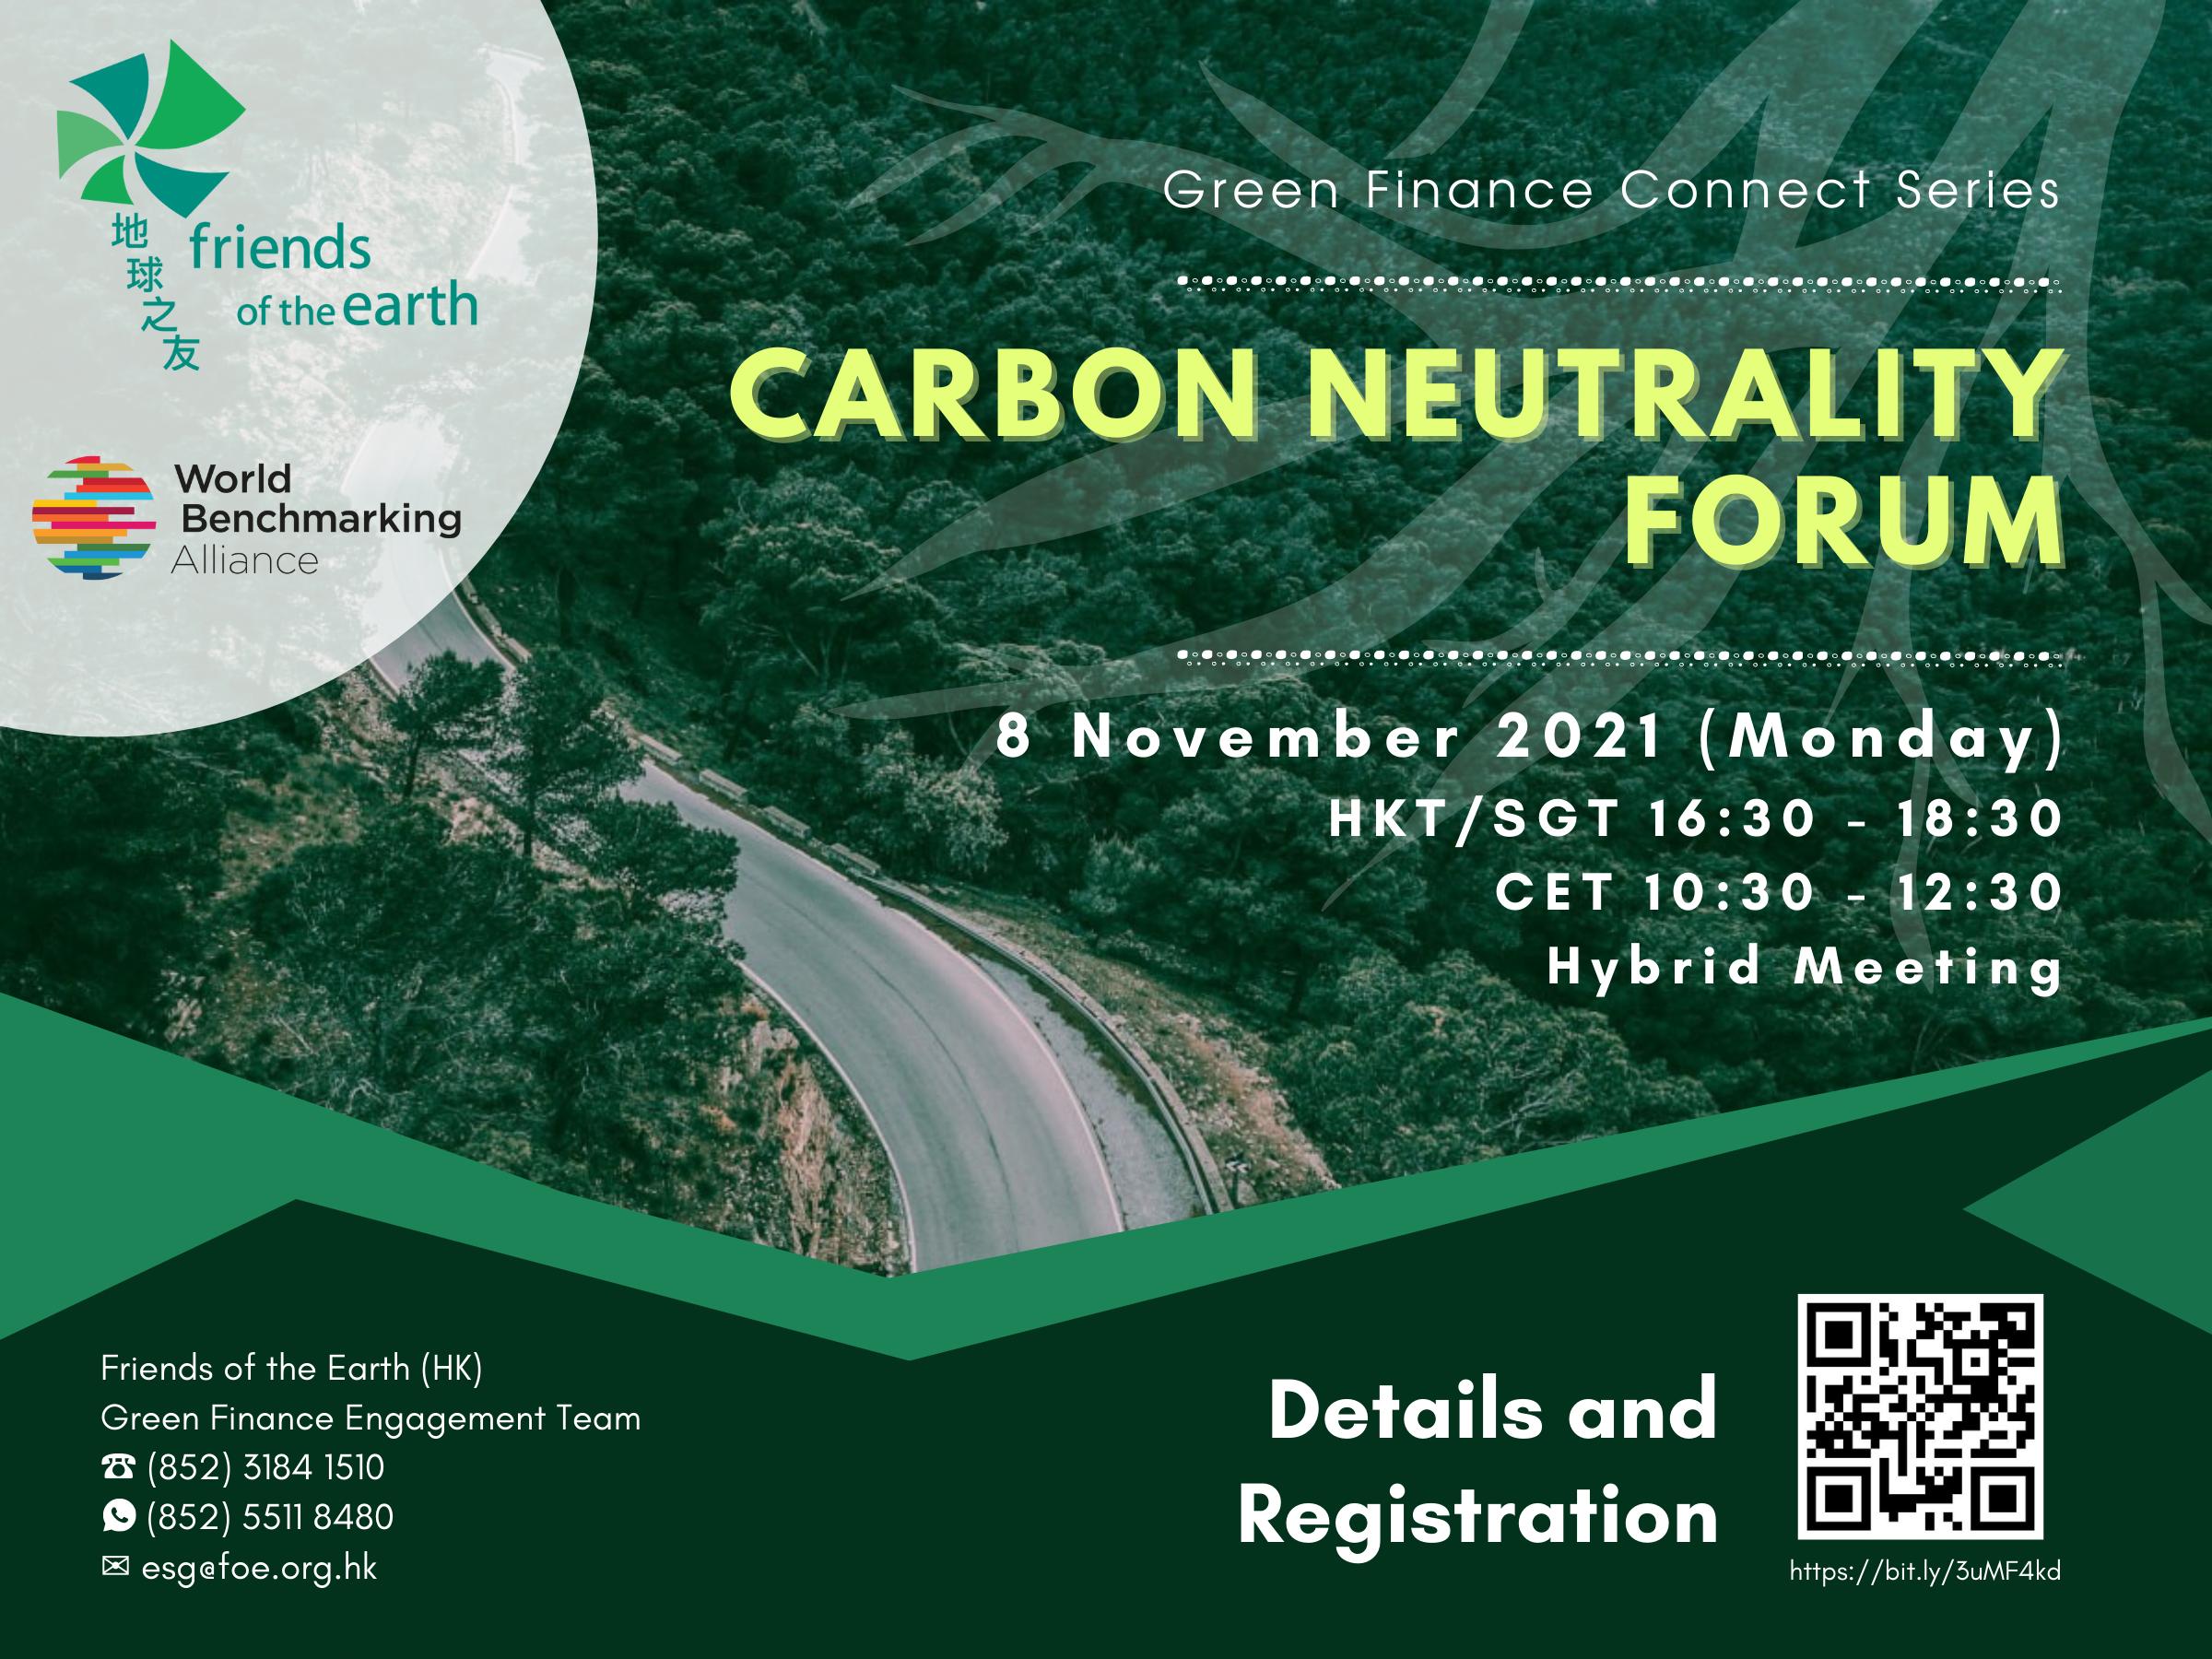 Carbon Neutrality Forum